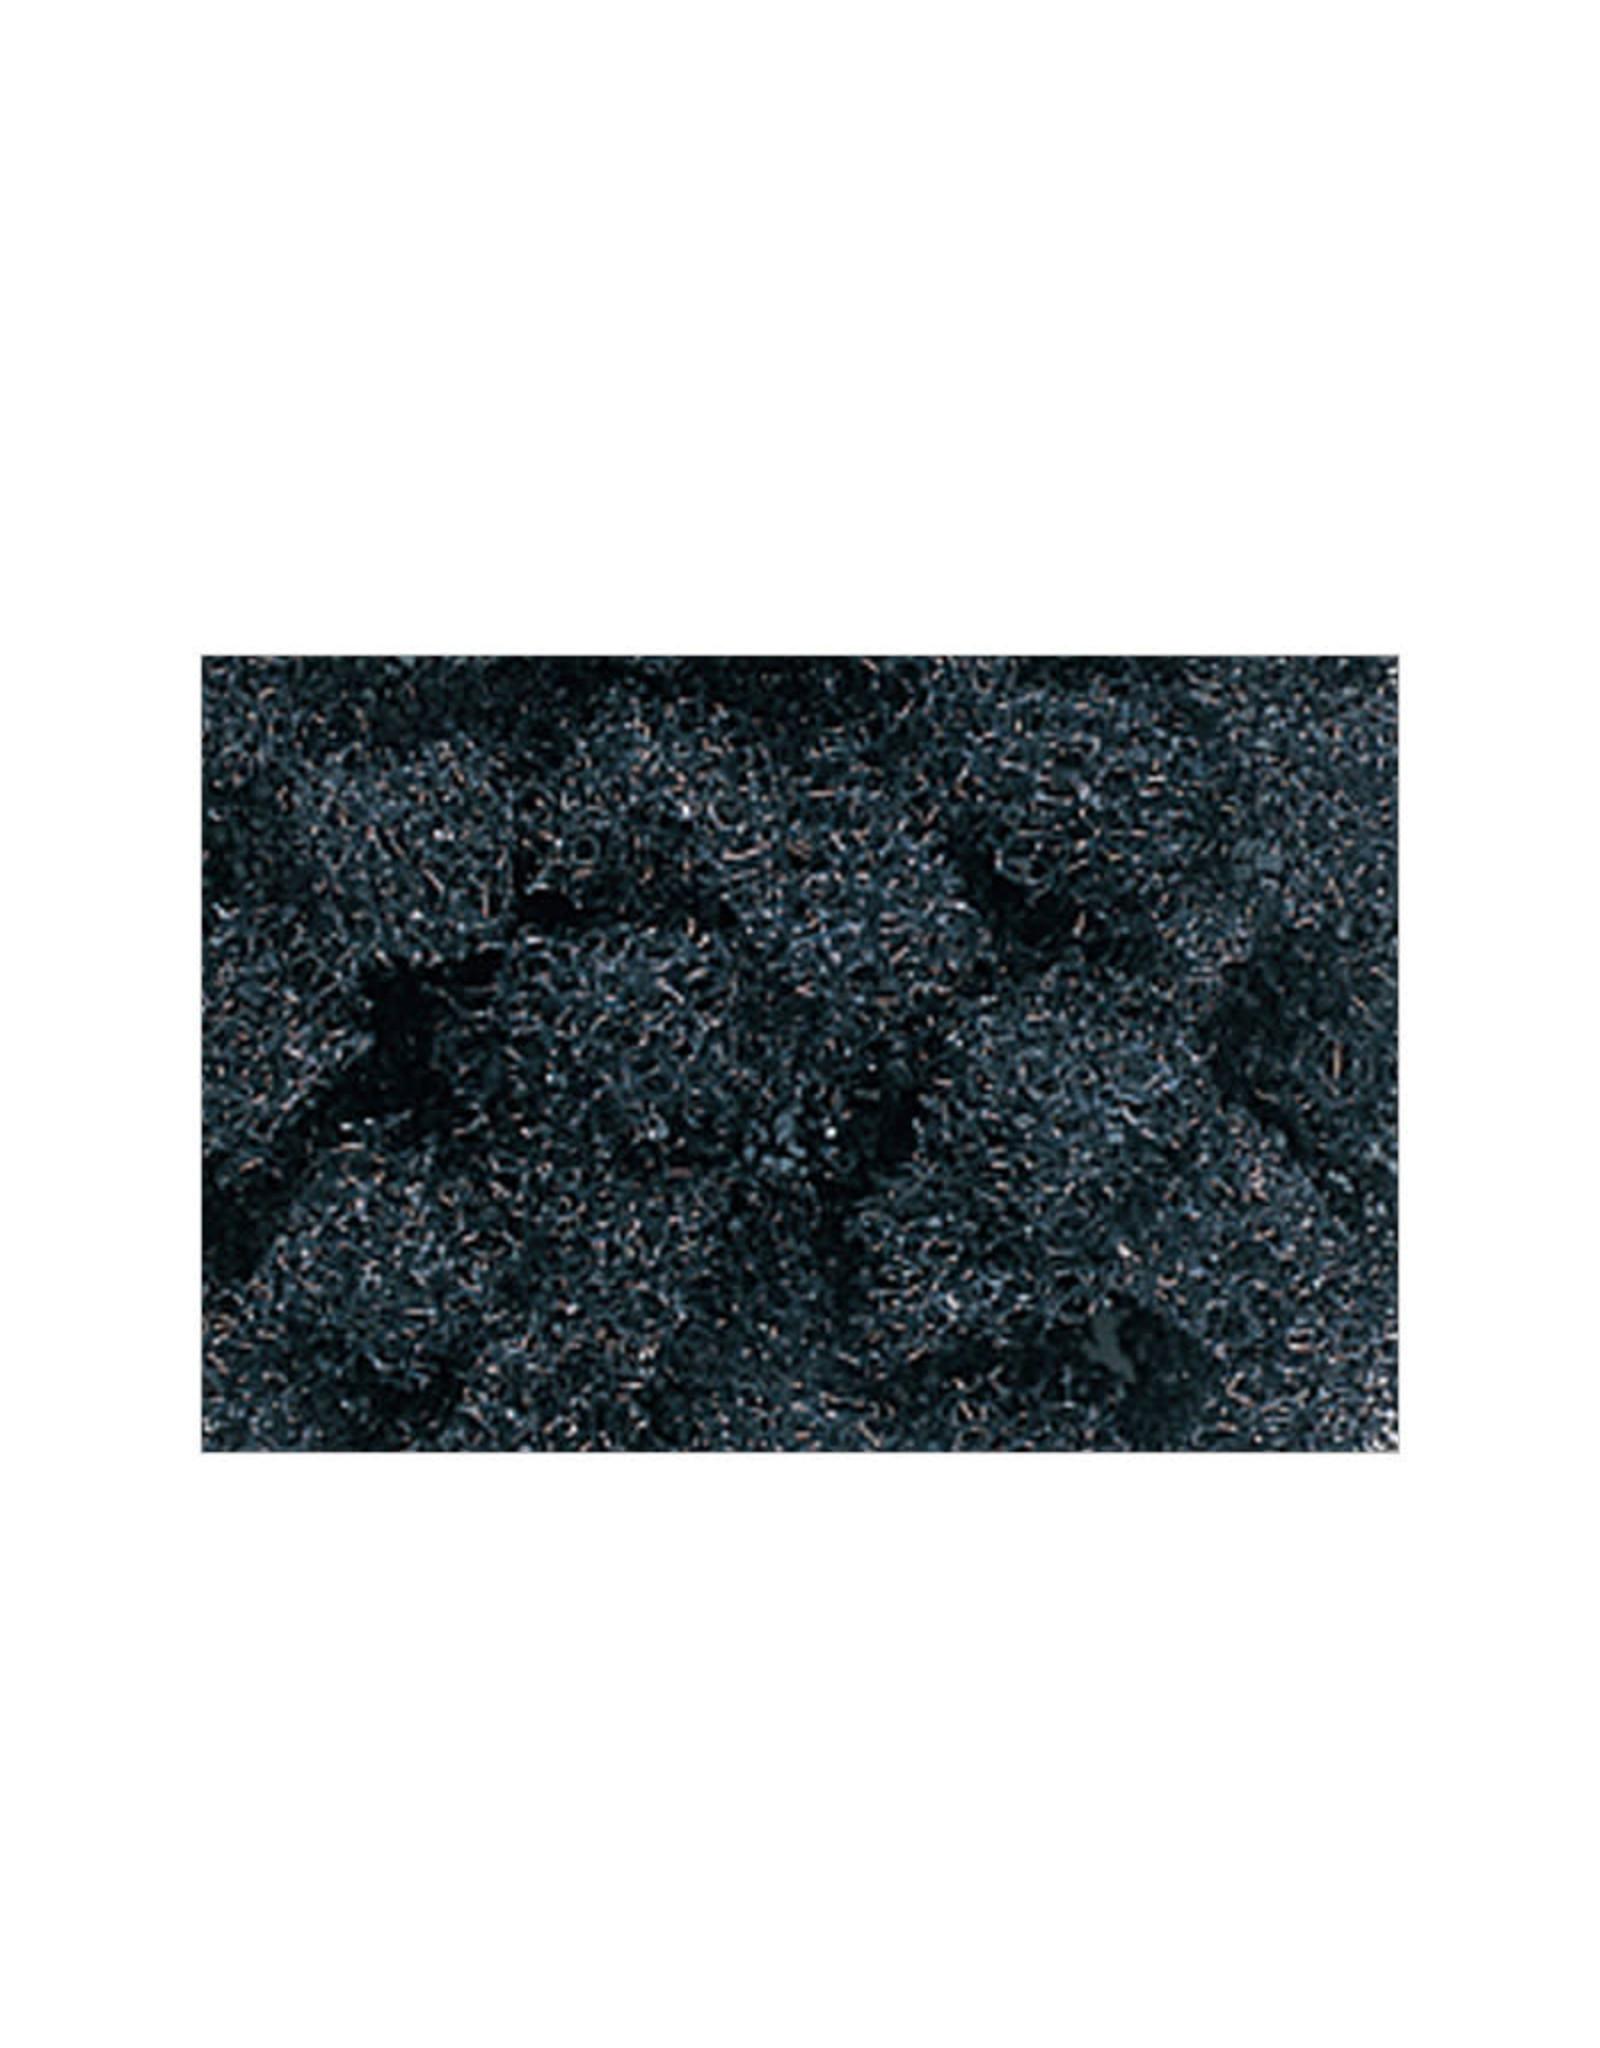 ADA Bio Cube 20 (2 l, black)